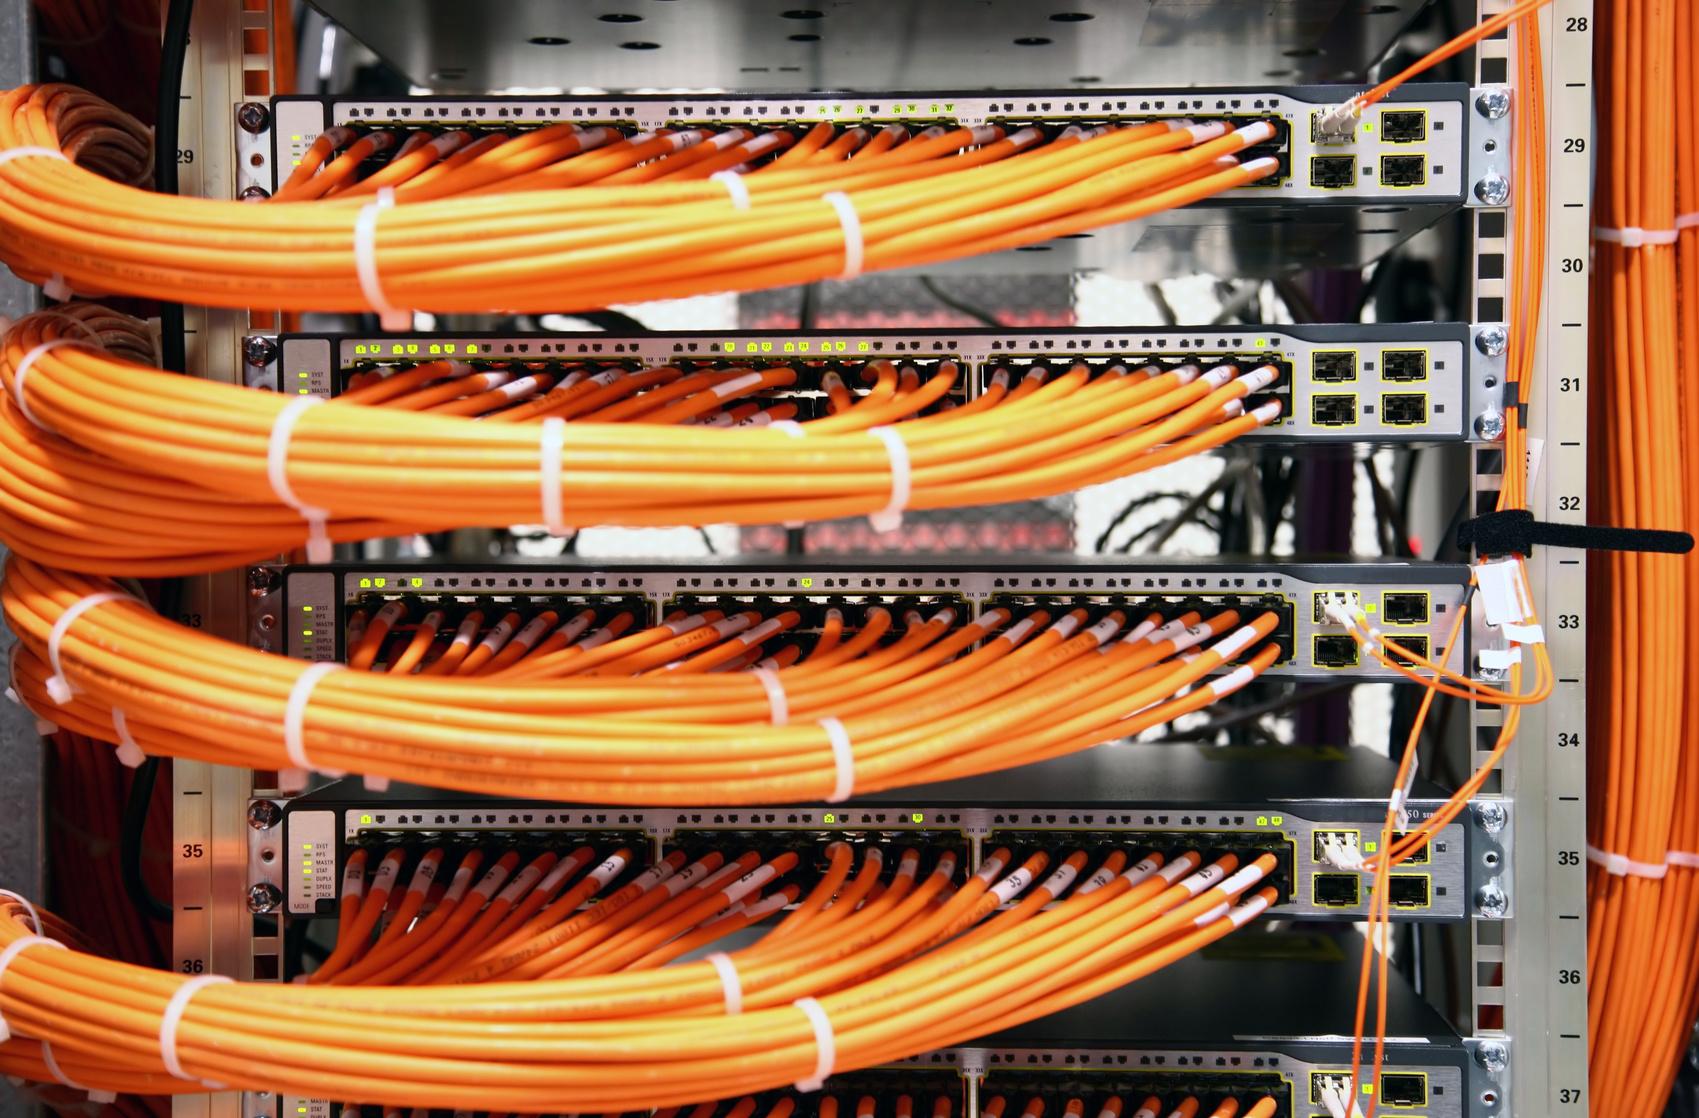 Netzwerk, Universelle Gebäudeverkabelung, UKV, Glasfaser - Tenic AG ...